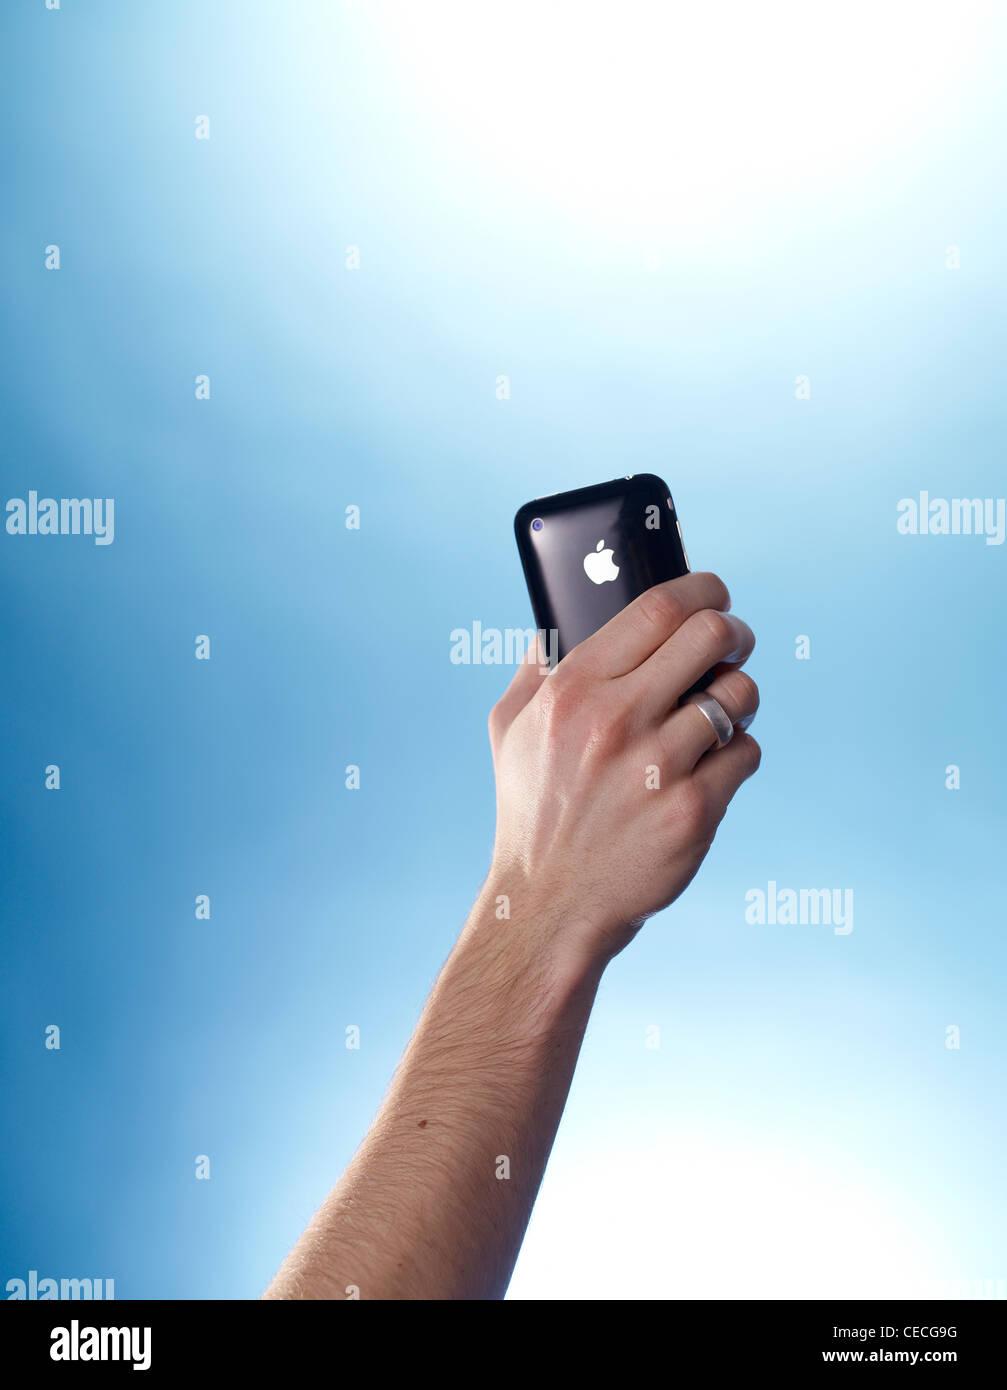 iPhone held aloft - Stock Image